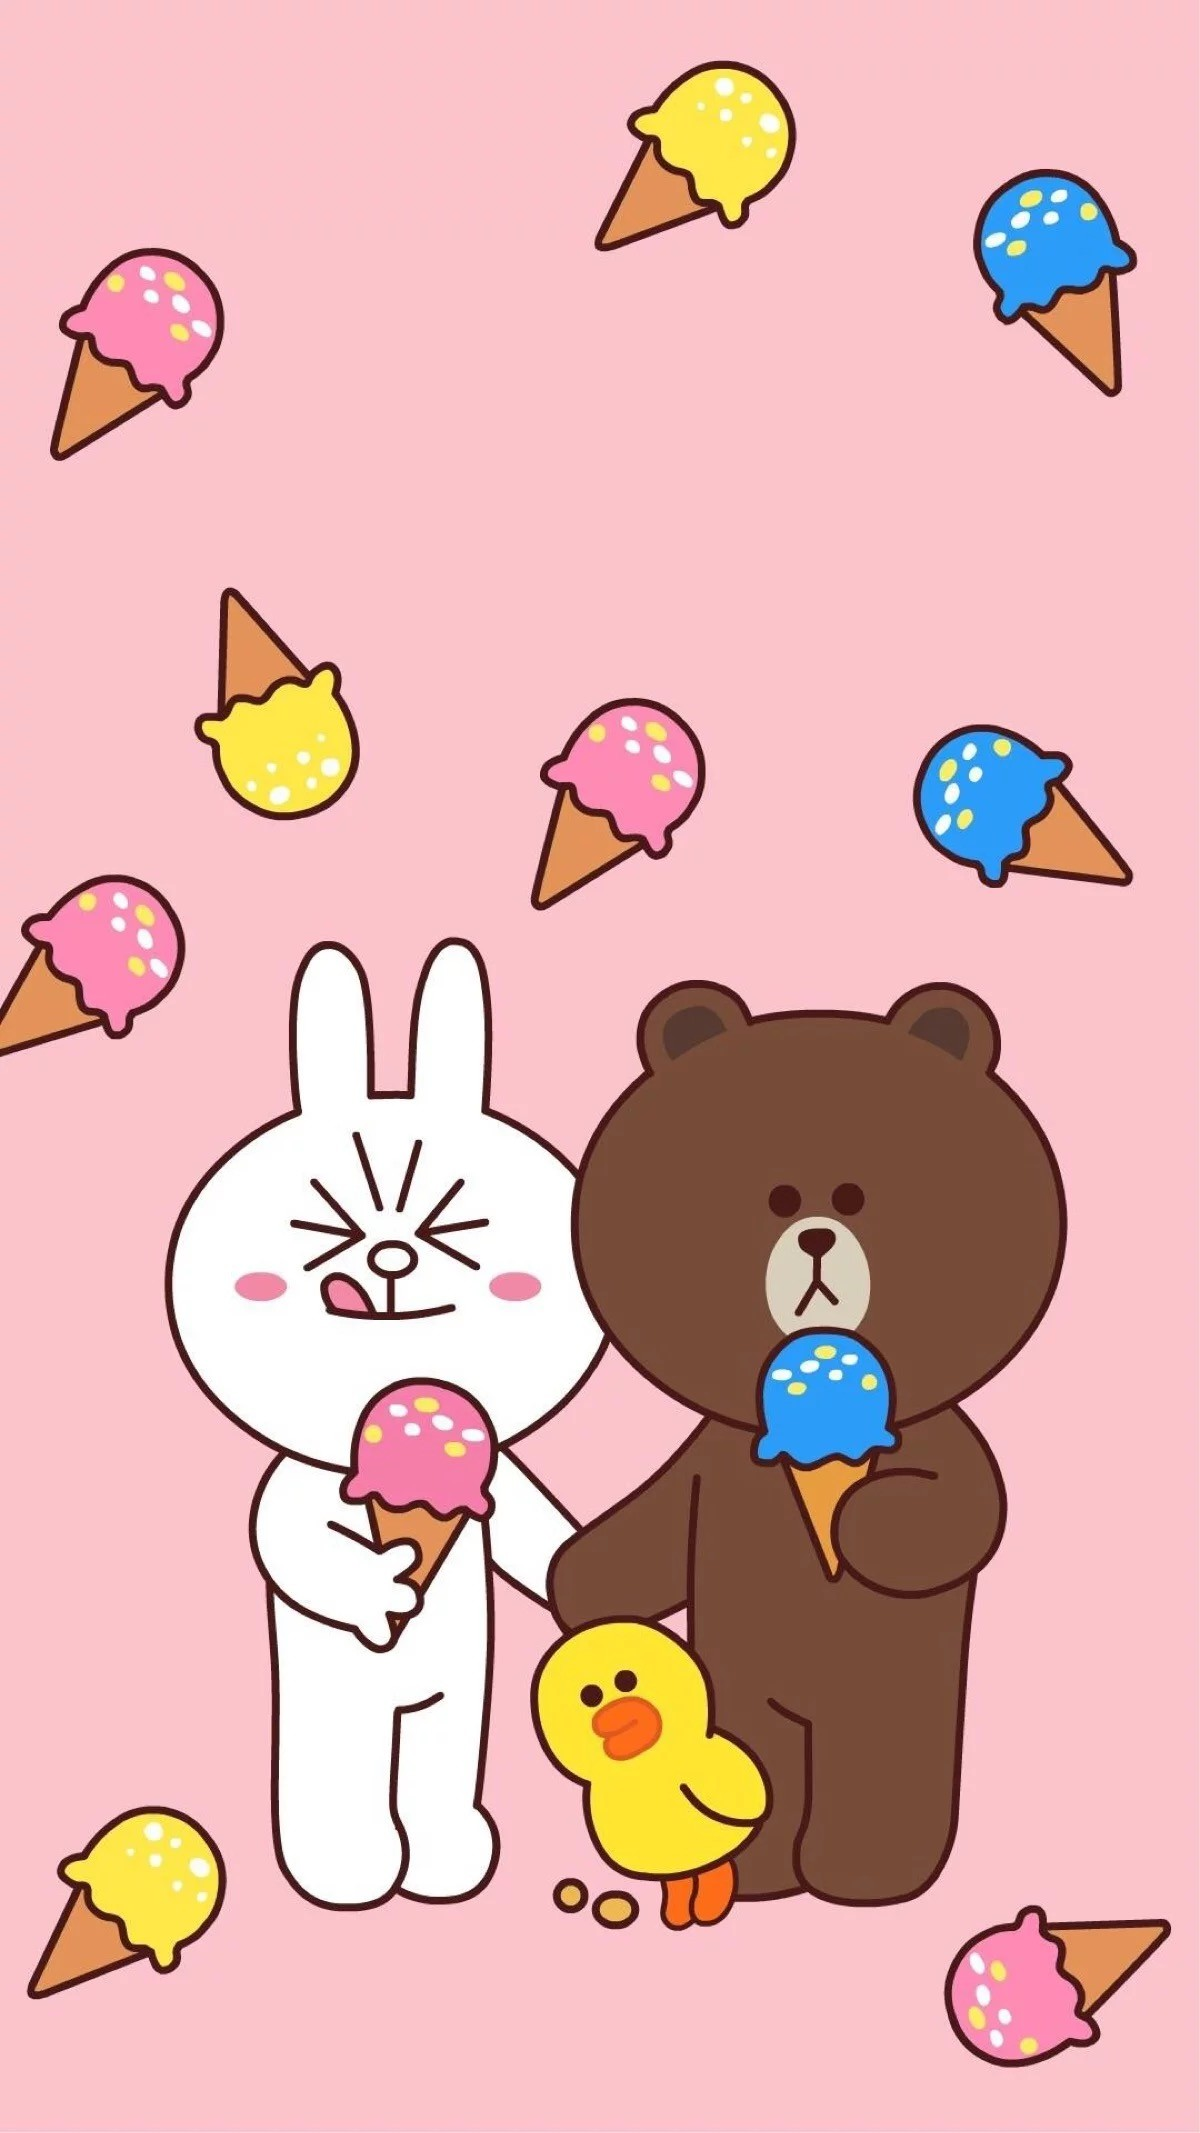 Phone Wallpapers, Iphone 7, Bunny, Cartoon, Screen, Funds, Love